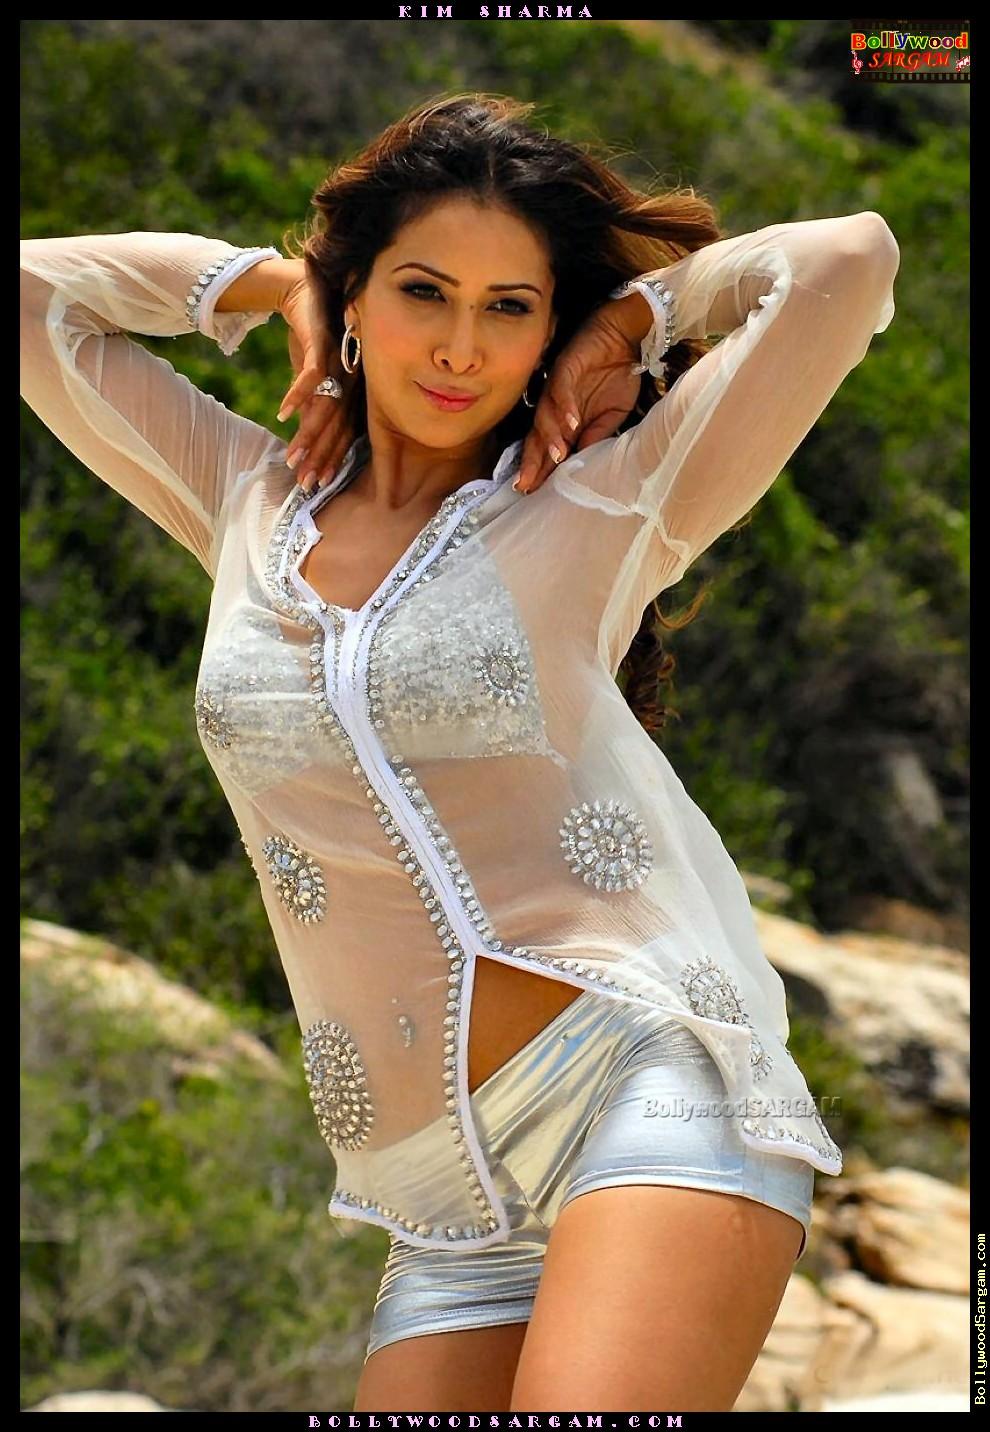 Kim Sharma sexy foto